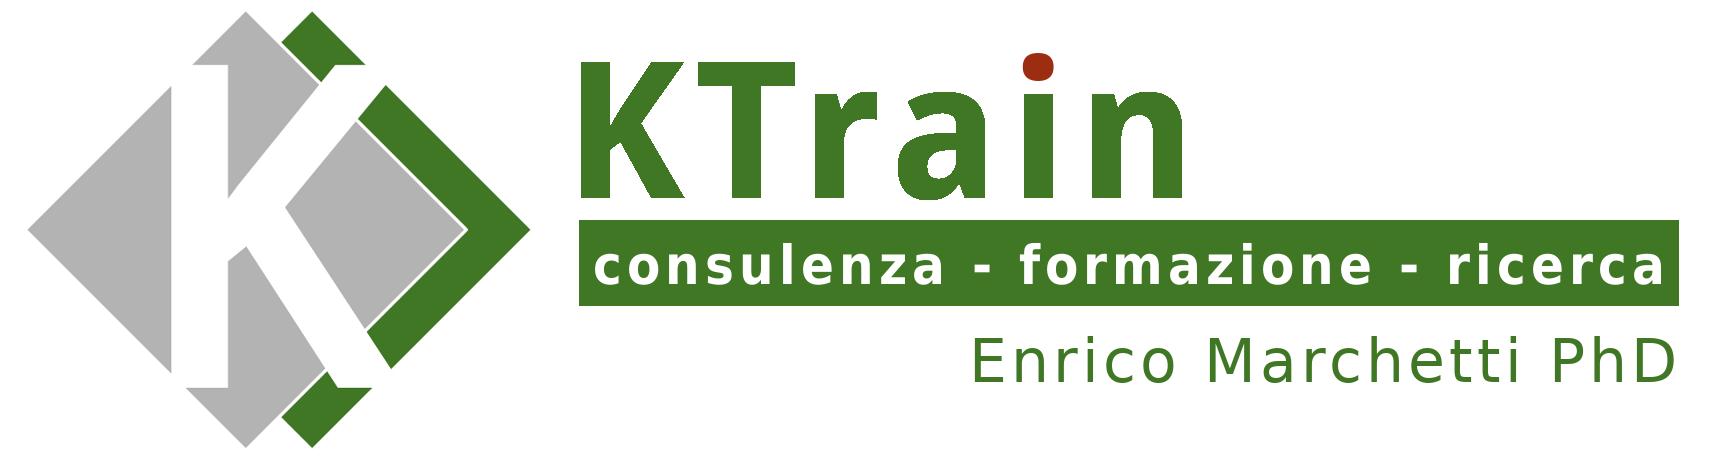 KTrain – Enrico Marchetti PhD